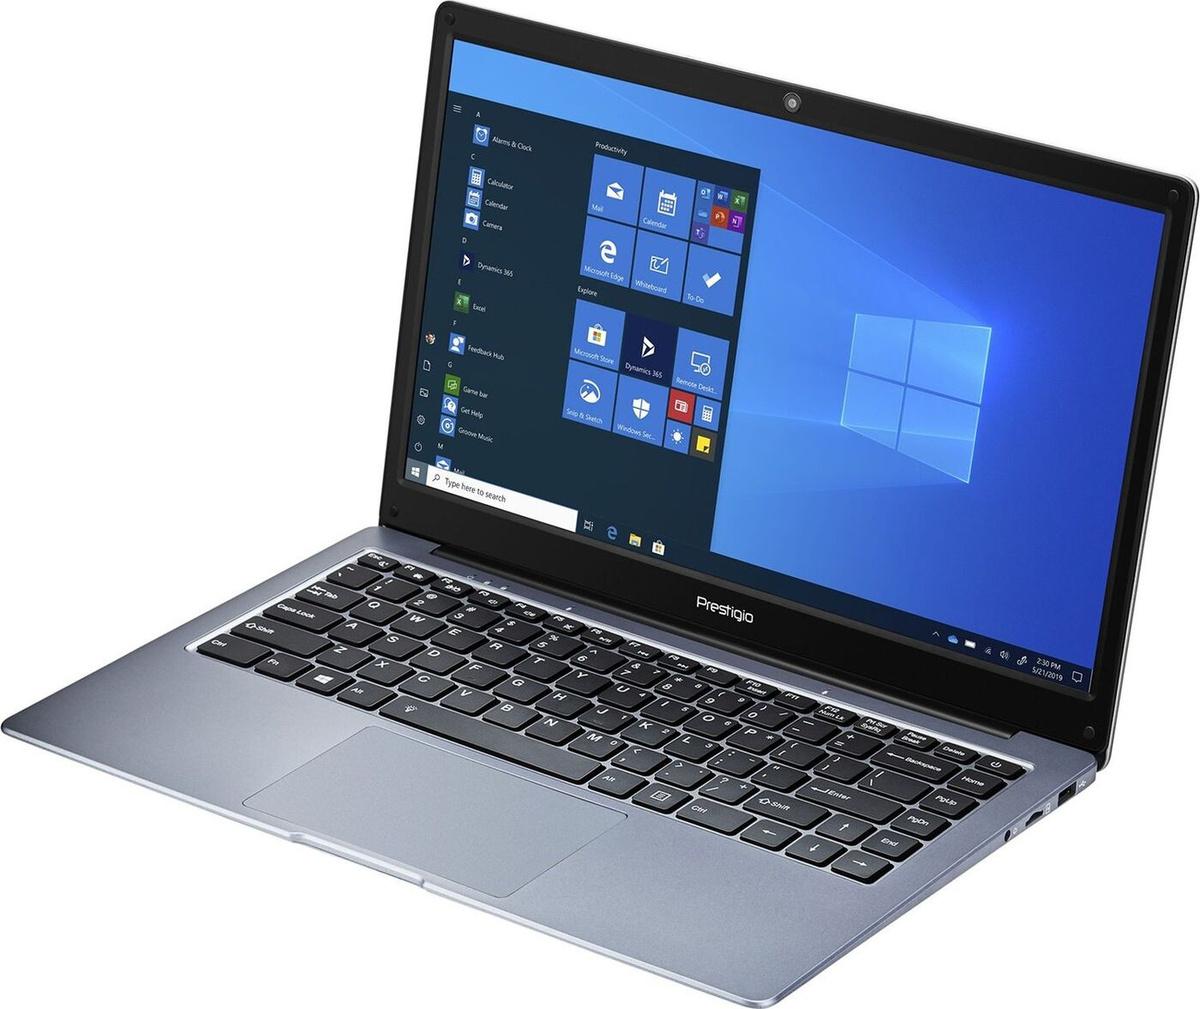 "14.1"" Ноутбук Prestigio SmartBook 141 C4 (PSB141C04CGP_DG_CIS), темно-серый #1"